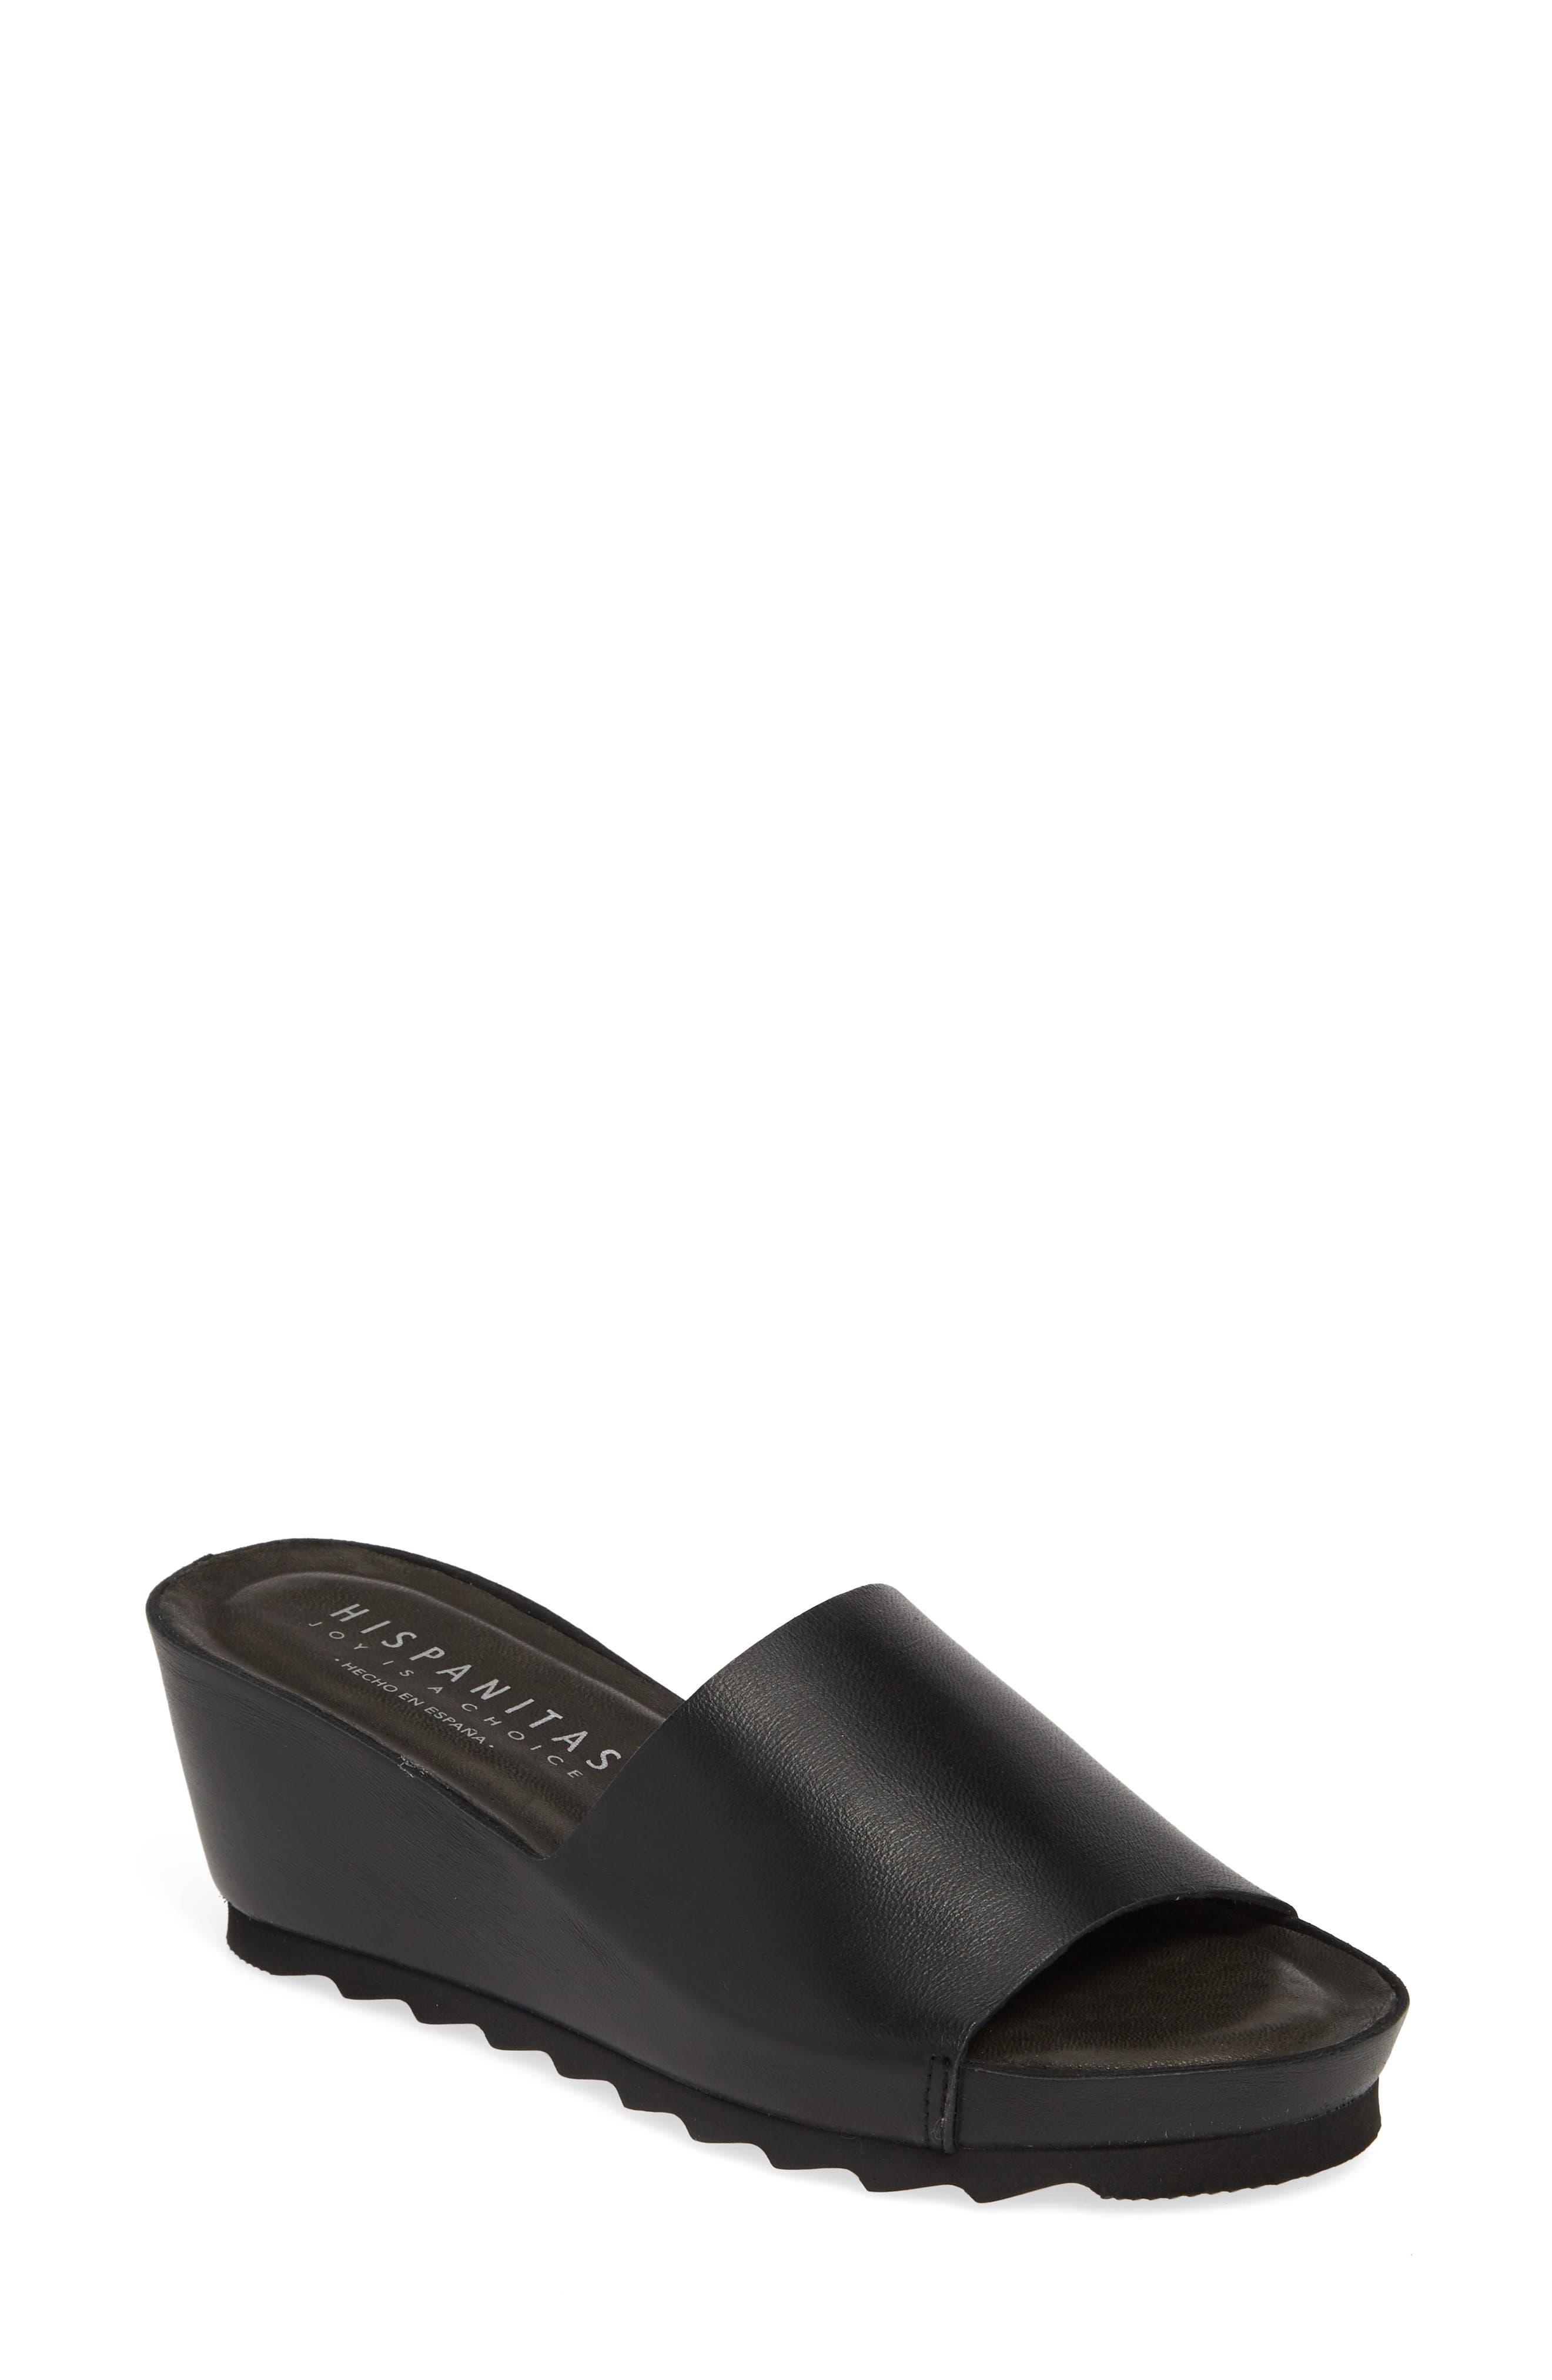 HISPANITAS Vega Slide Sandal, Main, color, BLACK LEATHER